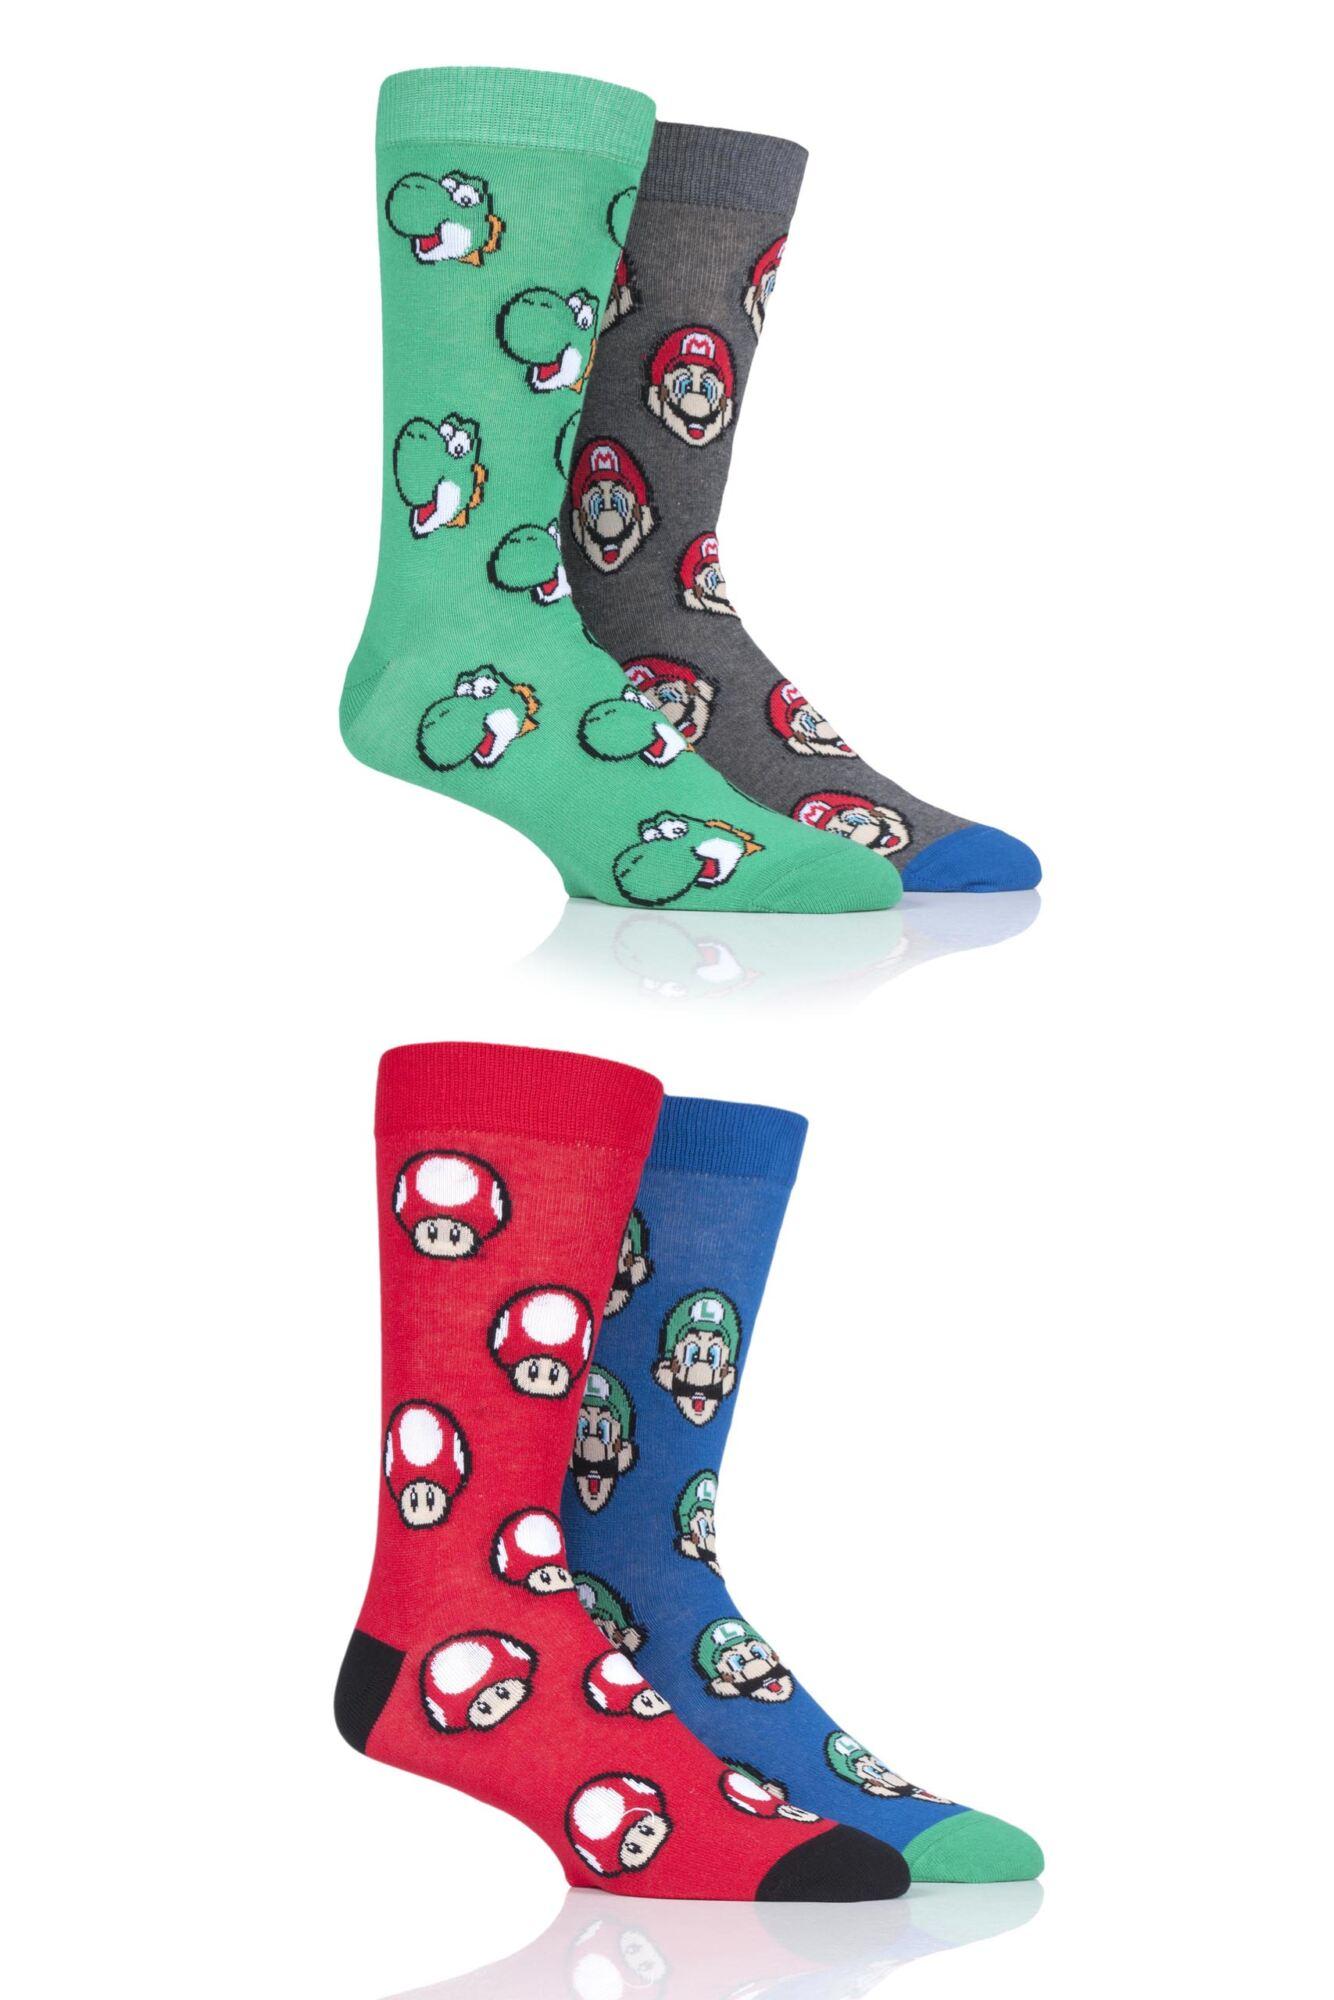 4 Pair Mario Yoshi Toad and Luigi Cotton Socks Unisex - Film & TV Characters